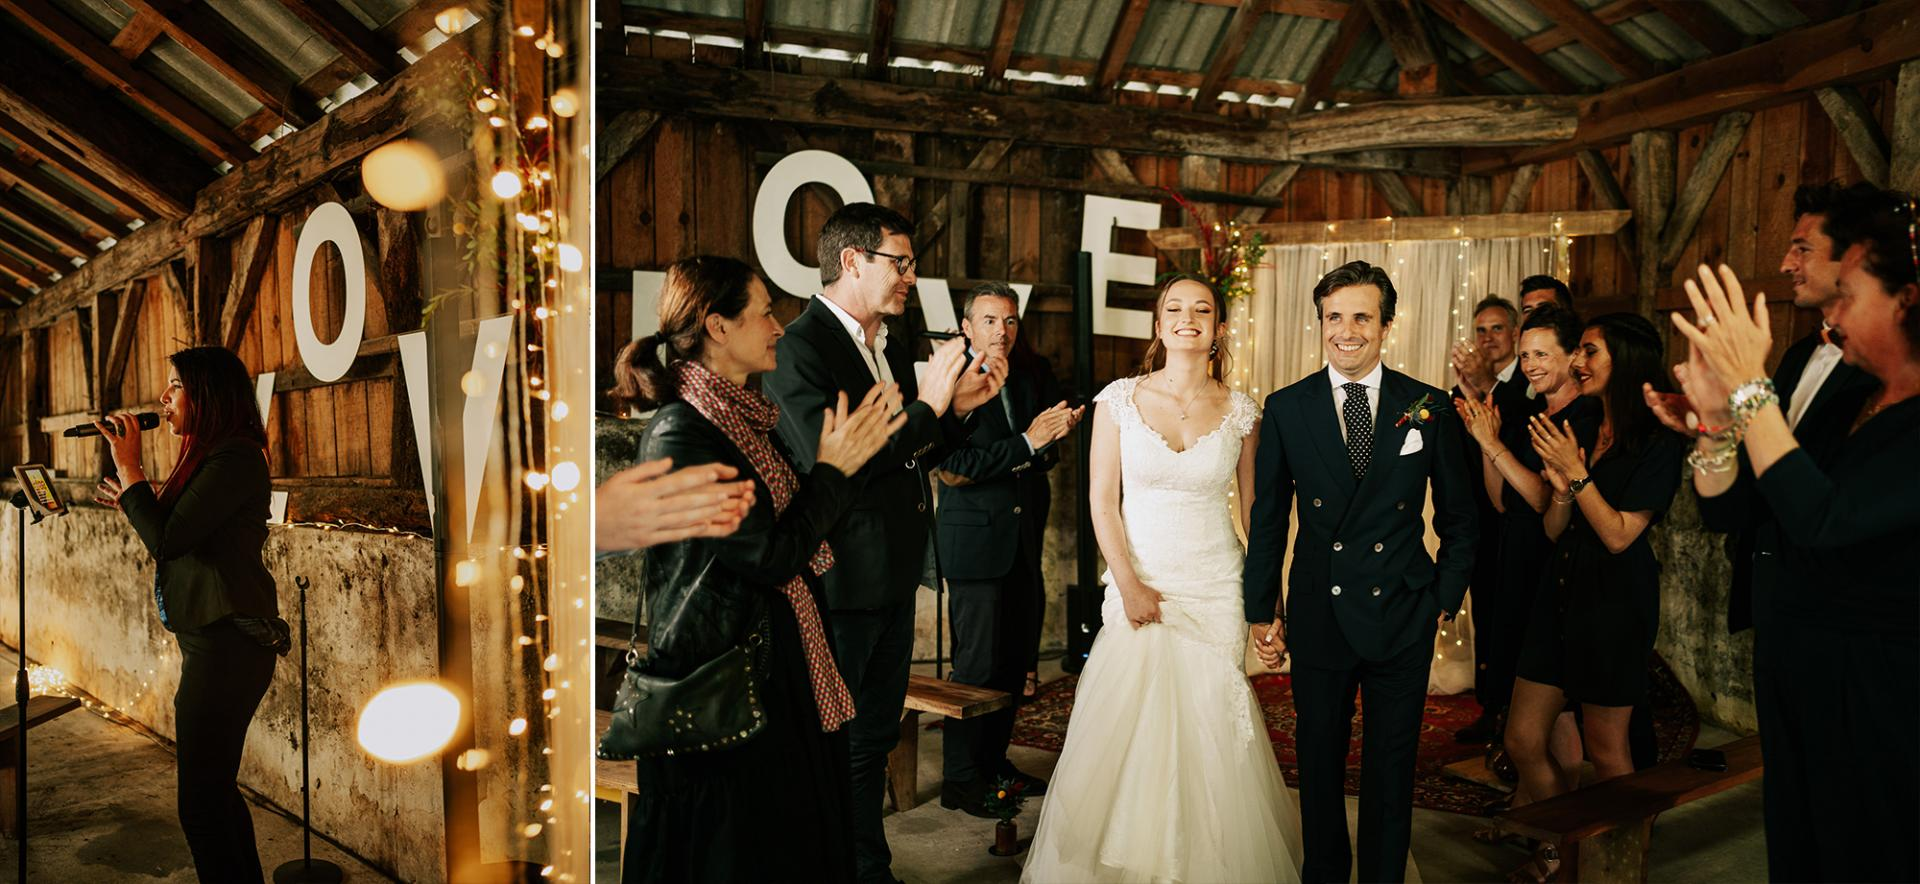 17 photographe de mariage landes dax aquitaine allison micallef moody style